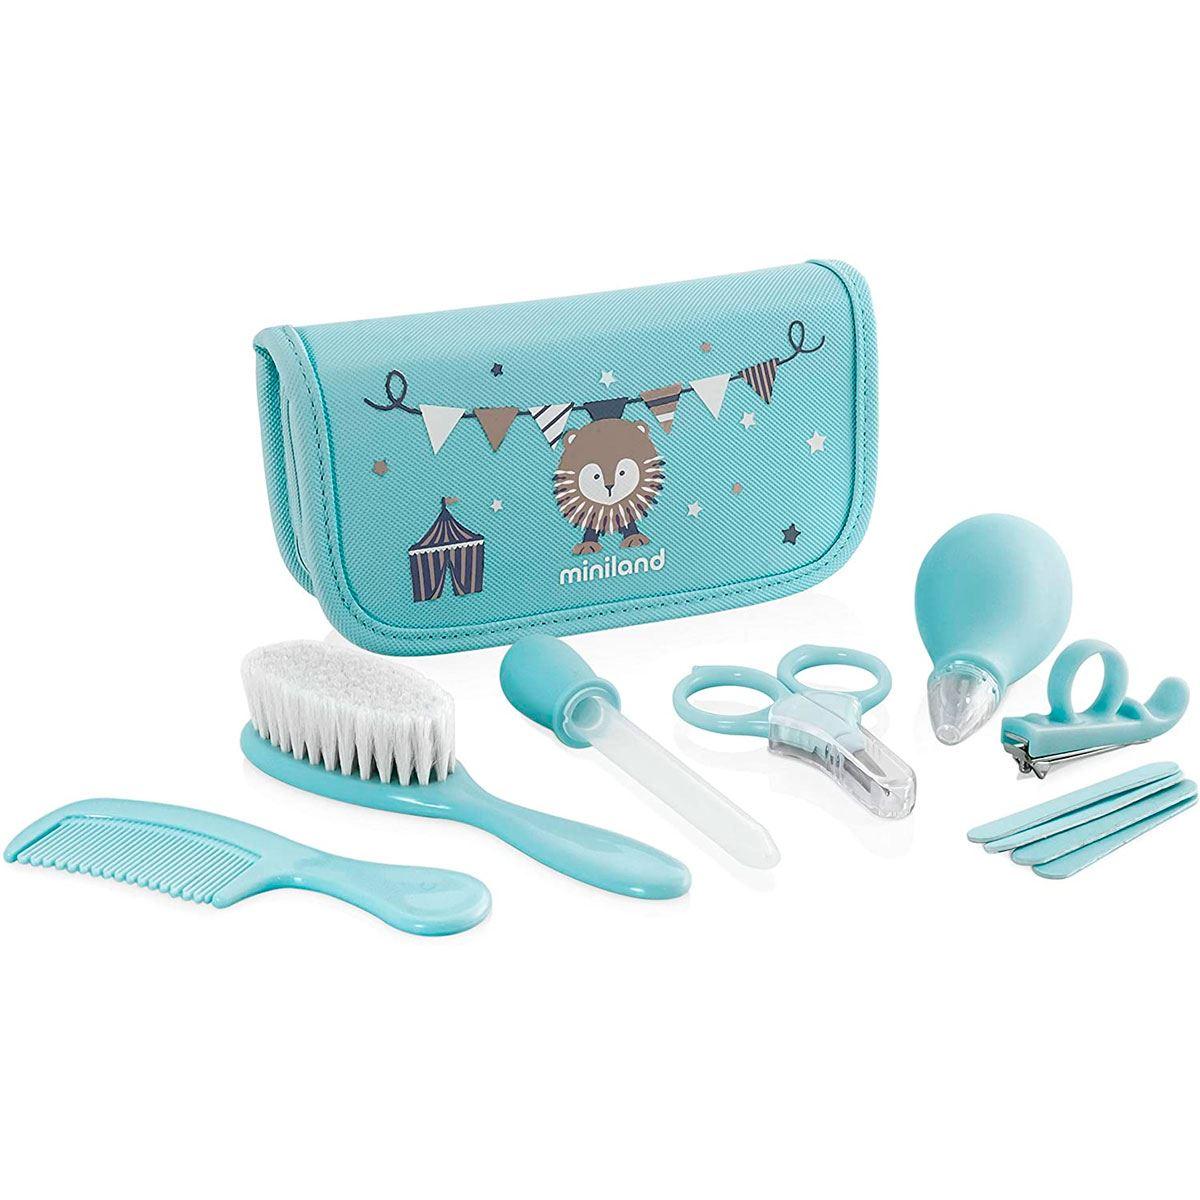 Neceser de Higiene de Miniland Azul